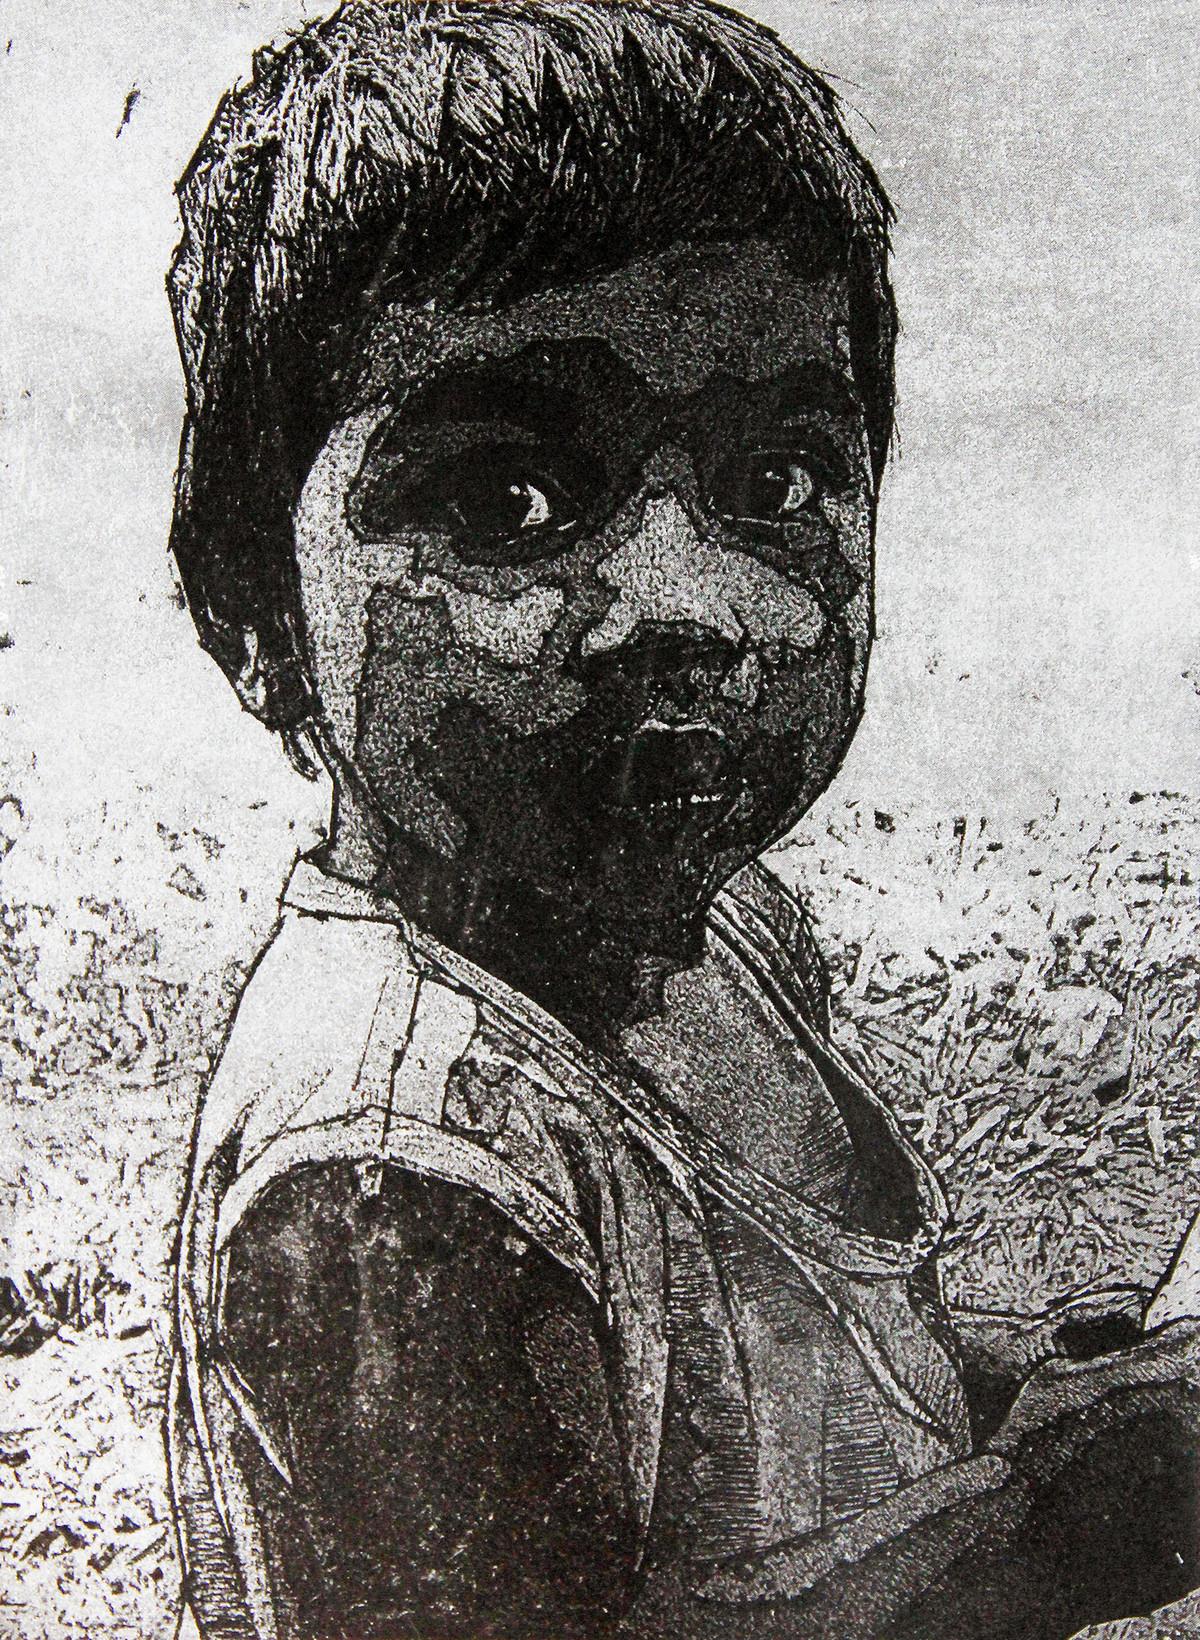 I AM SHAMBHU by Tapan Madkikar, Expressionism Printmaking, Etching on Paper, Gray color